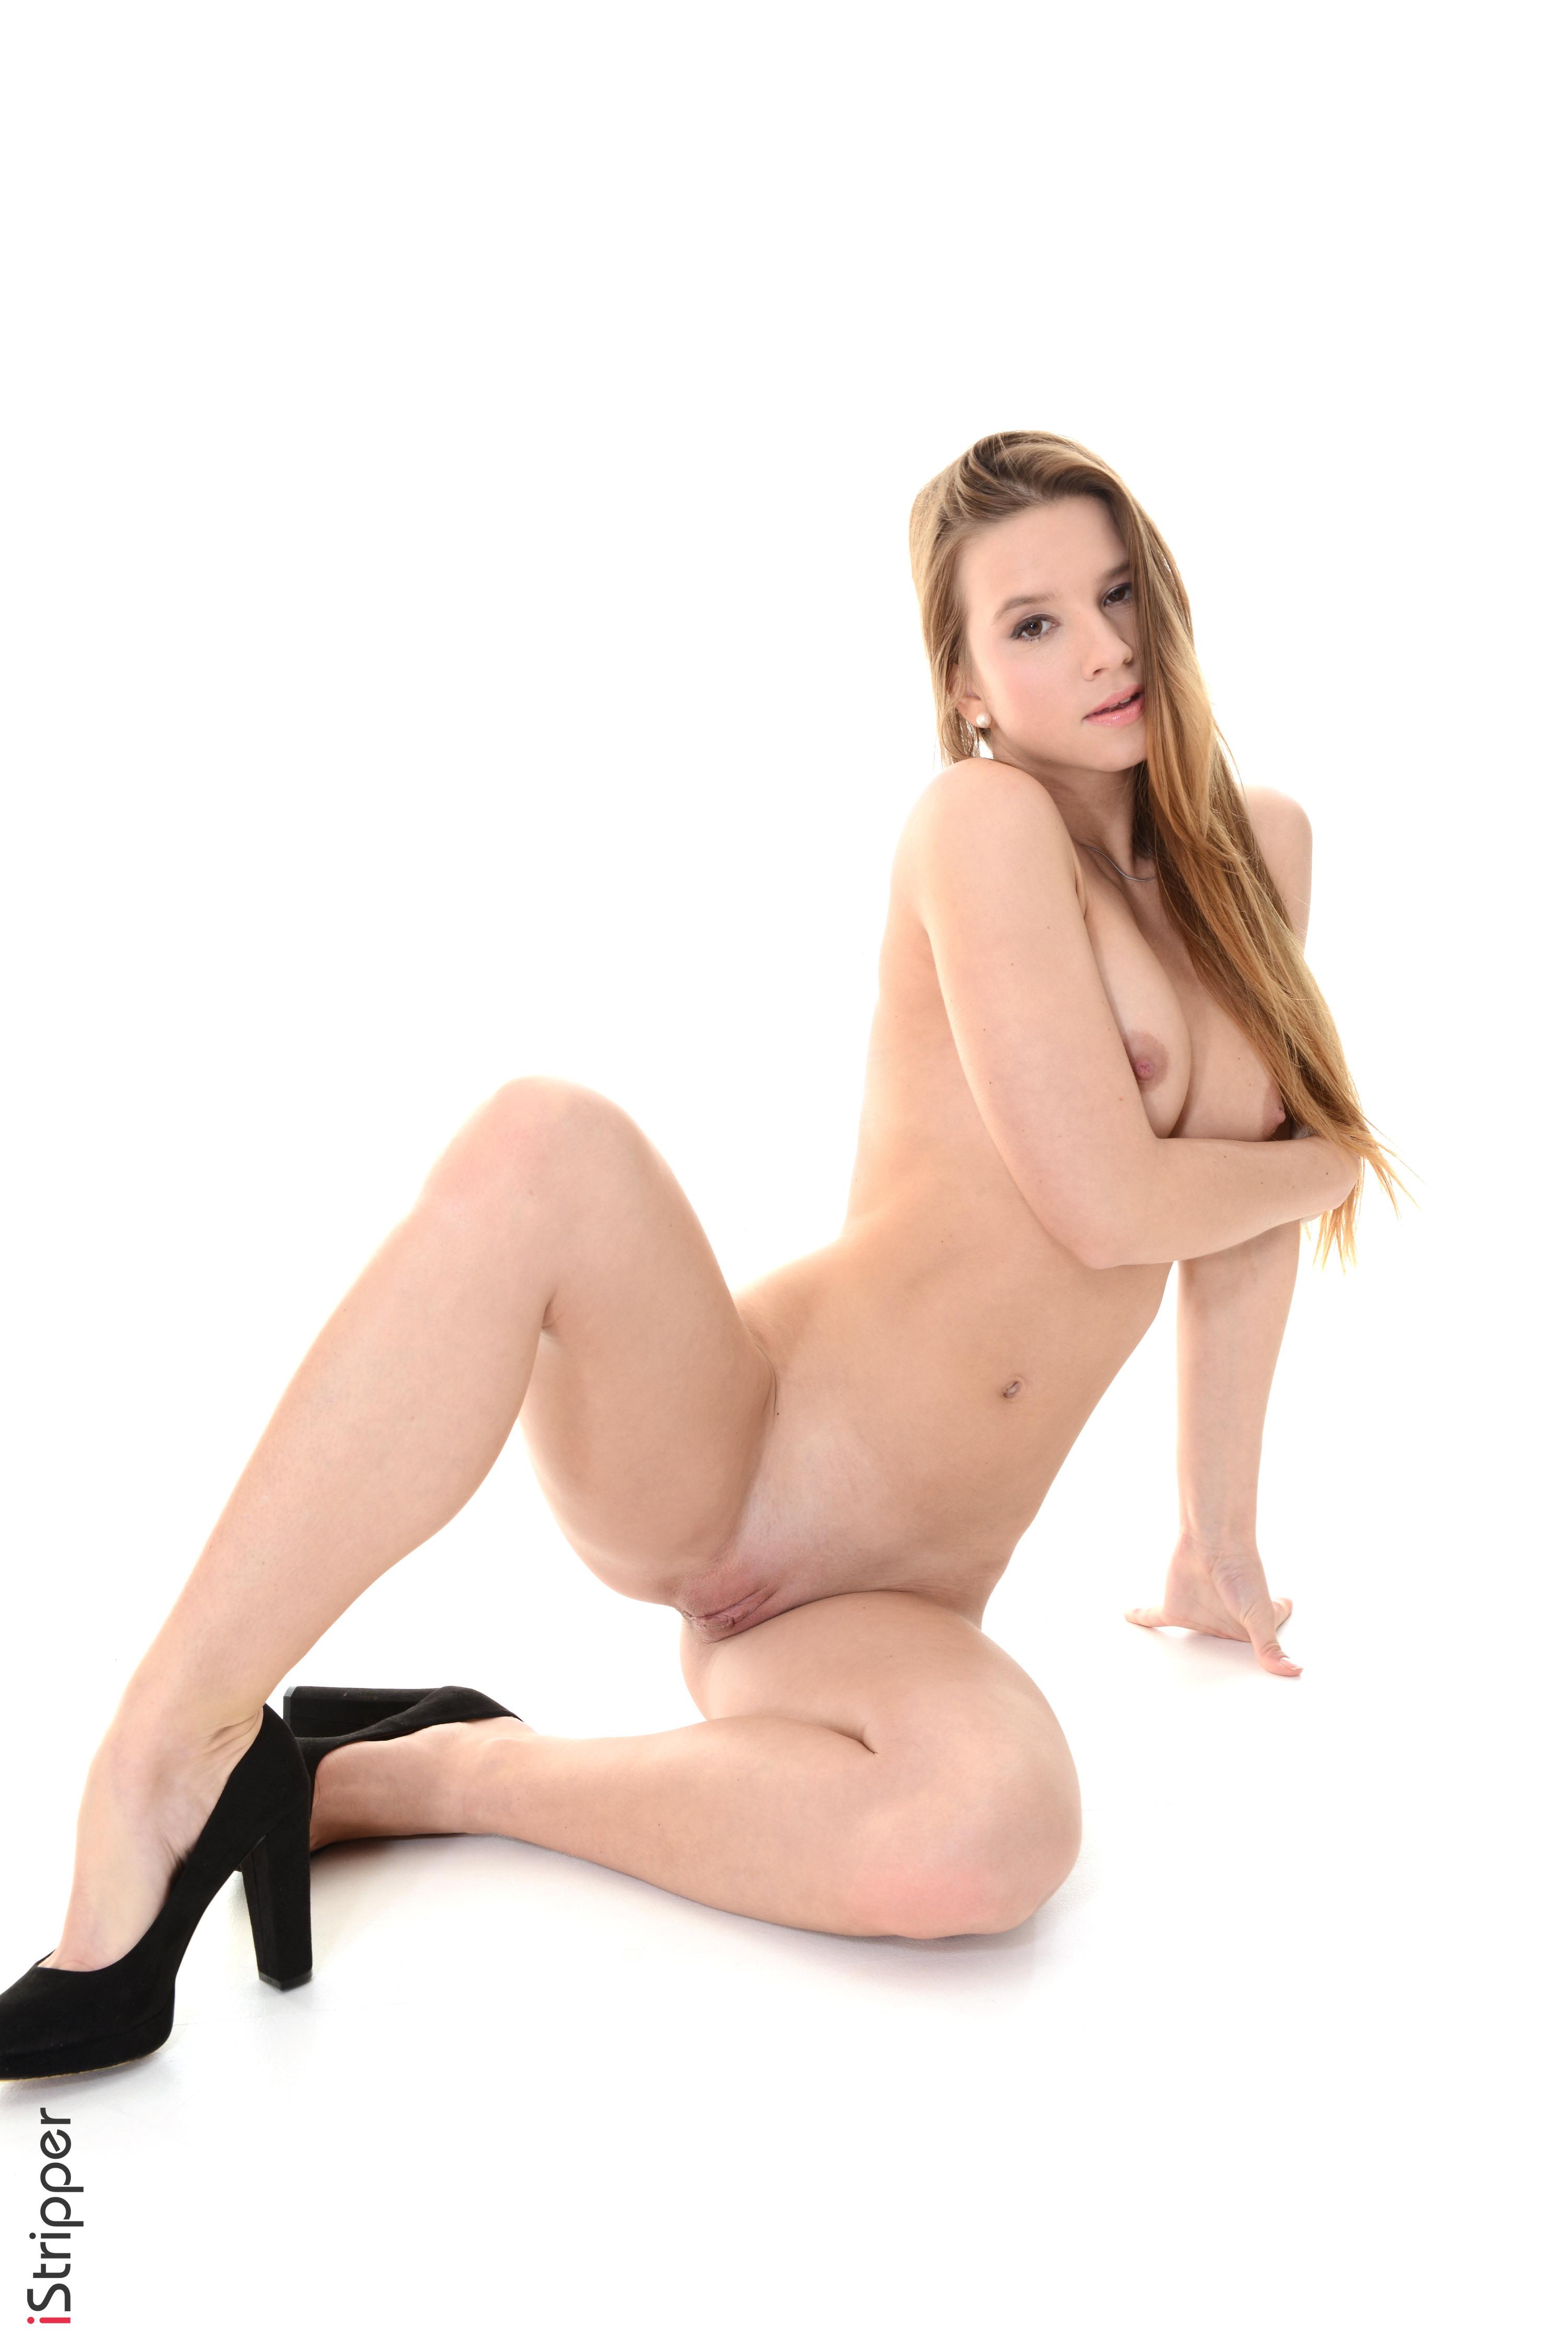 nude female wallpaper